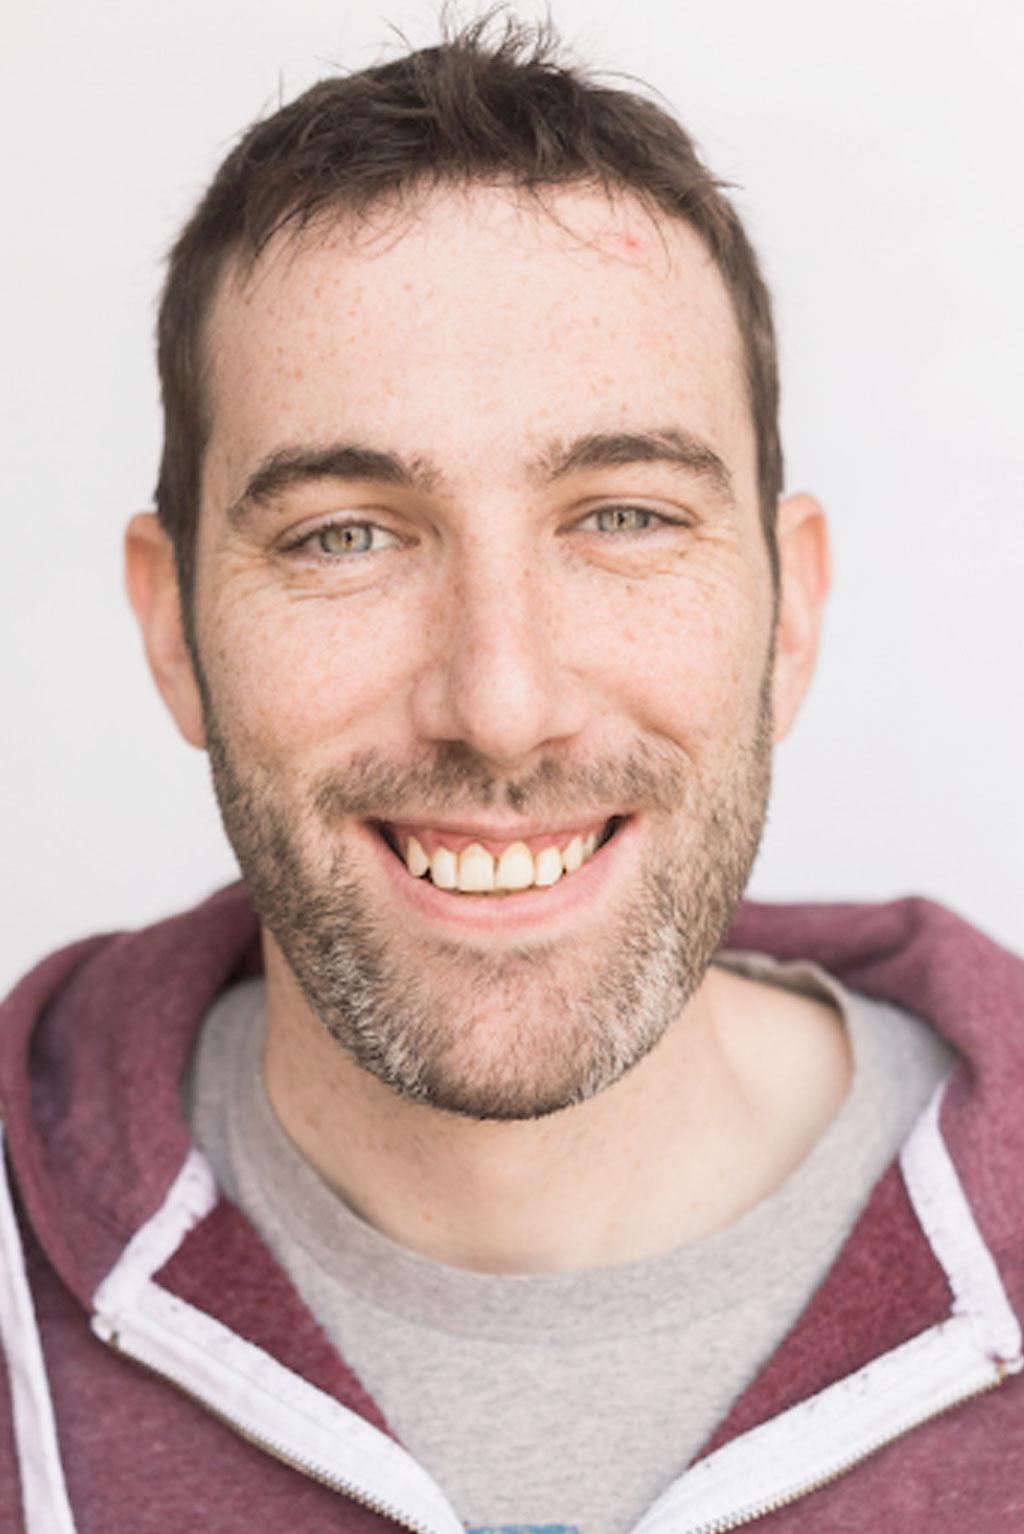 Kyle Hensman